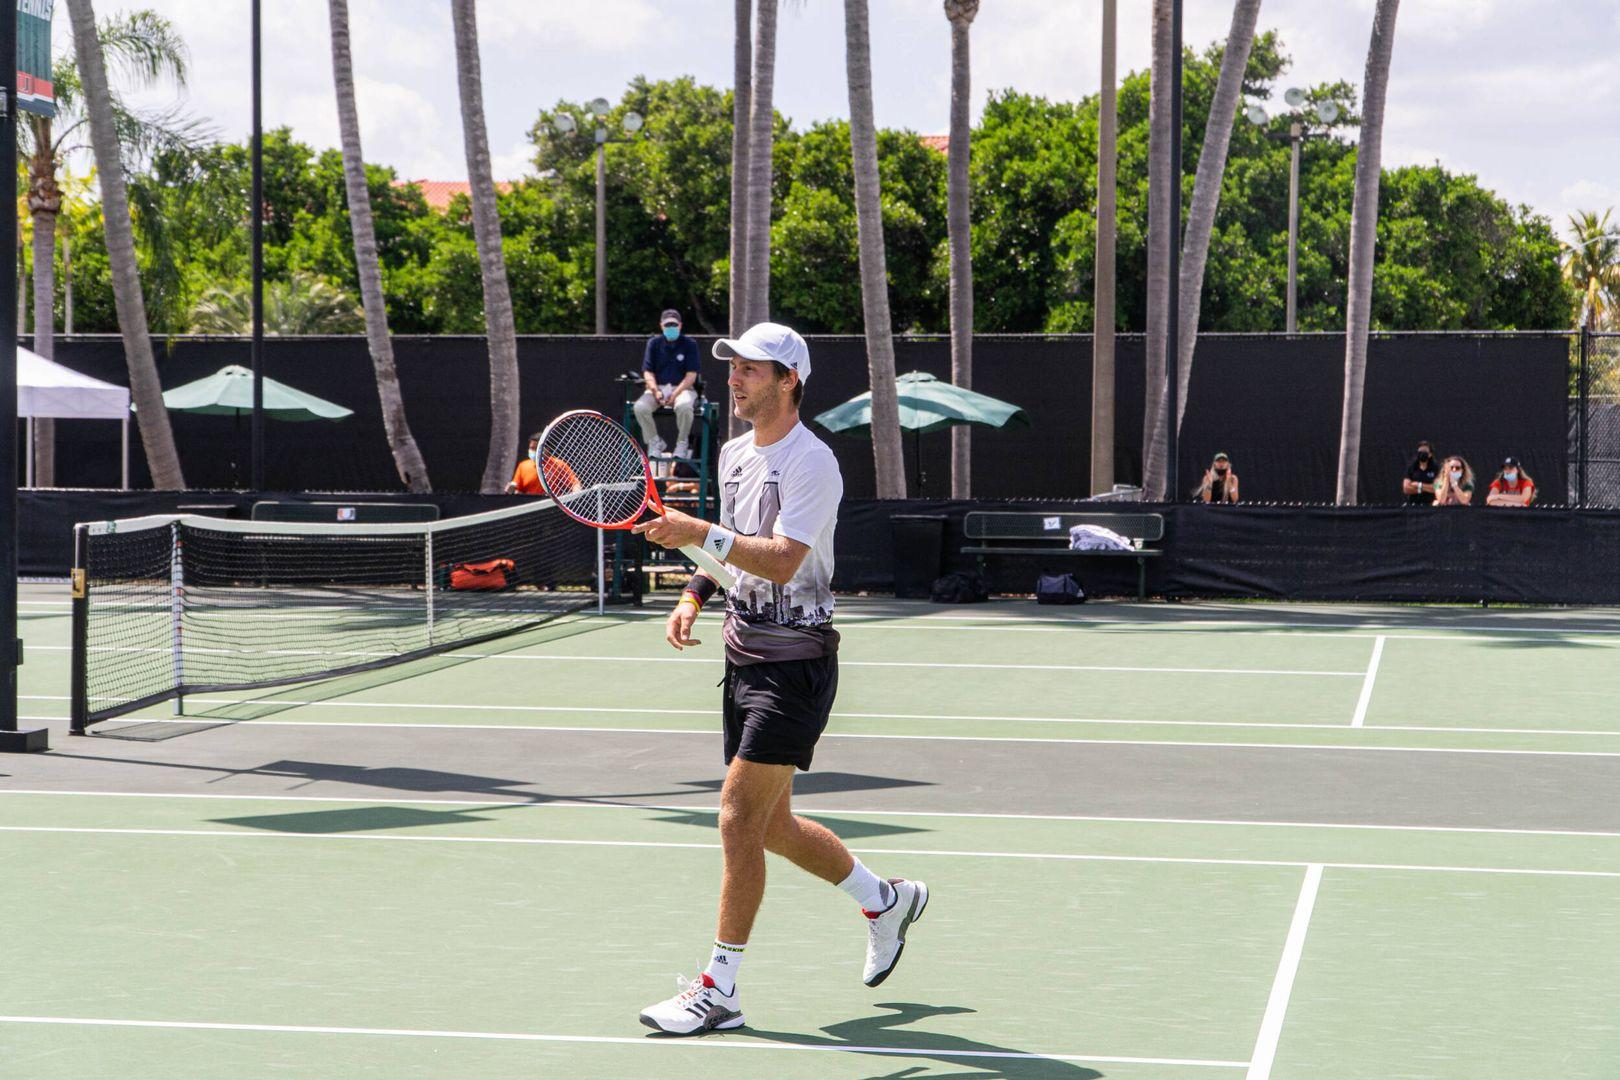 Men's Tennis Downs No. 29 USF, 4-3